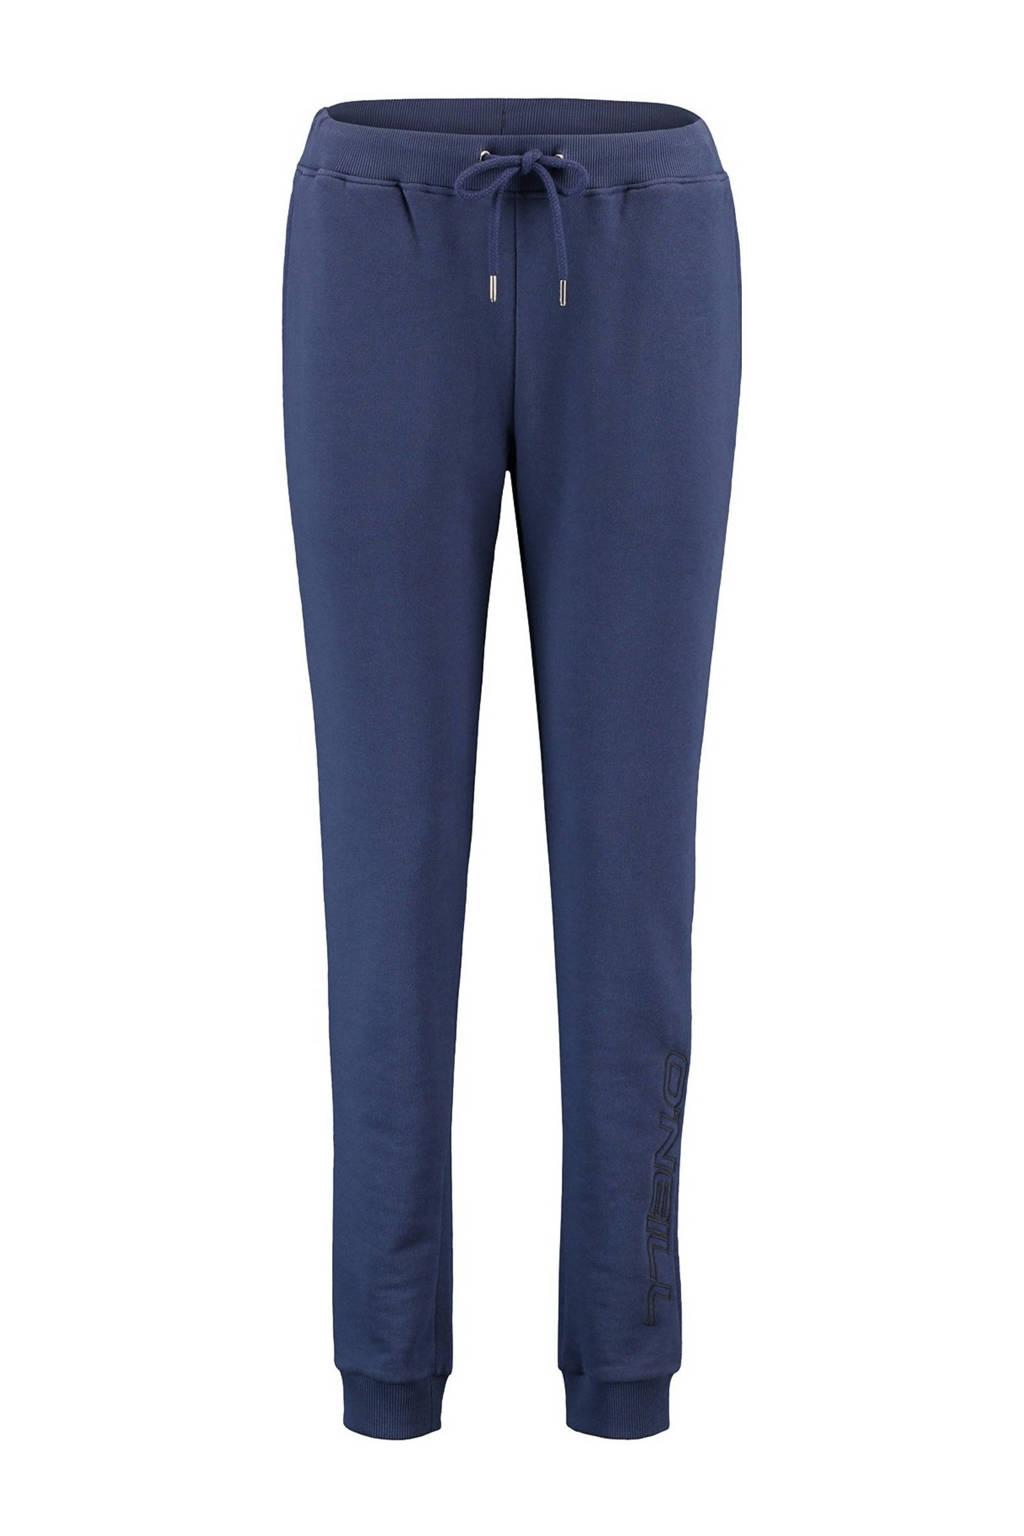 O'Neill joggingbroek donkerblauw, Donkerblauw